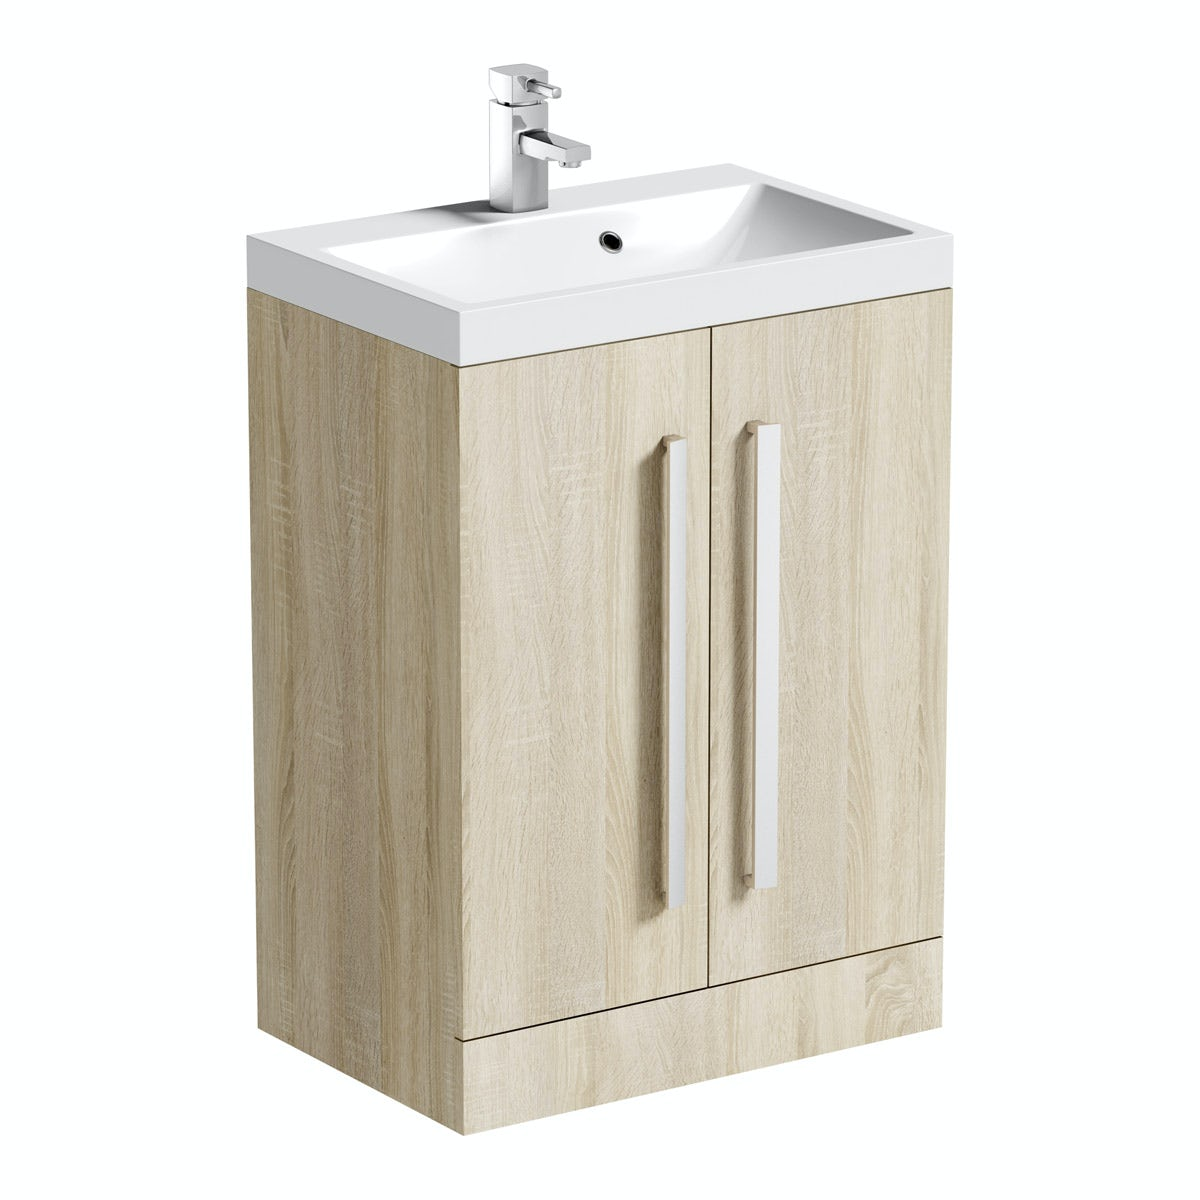 Orchard Wye oak vanity unit with basin 600mm